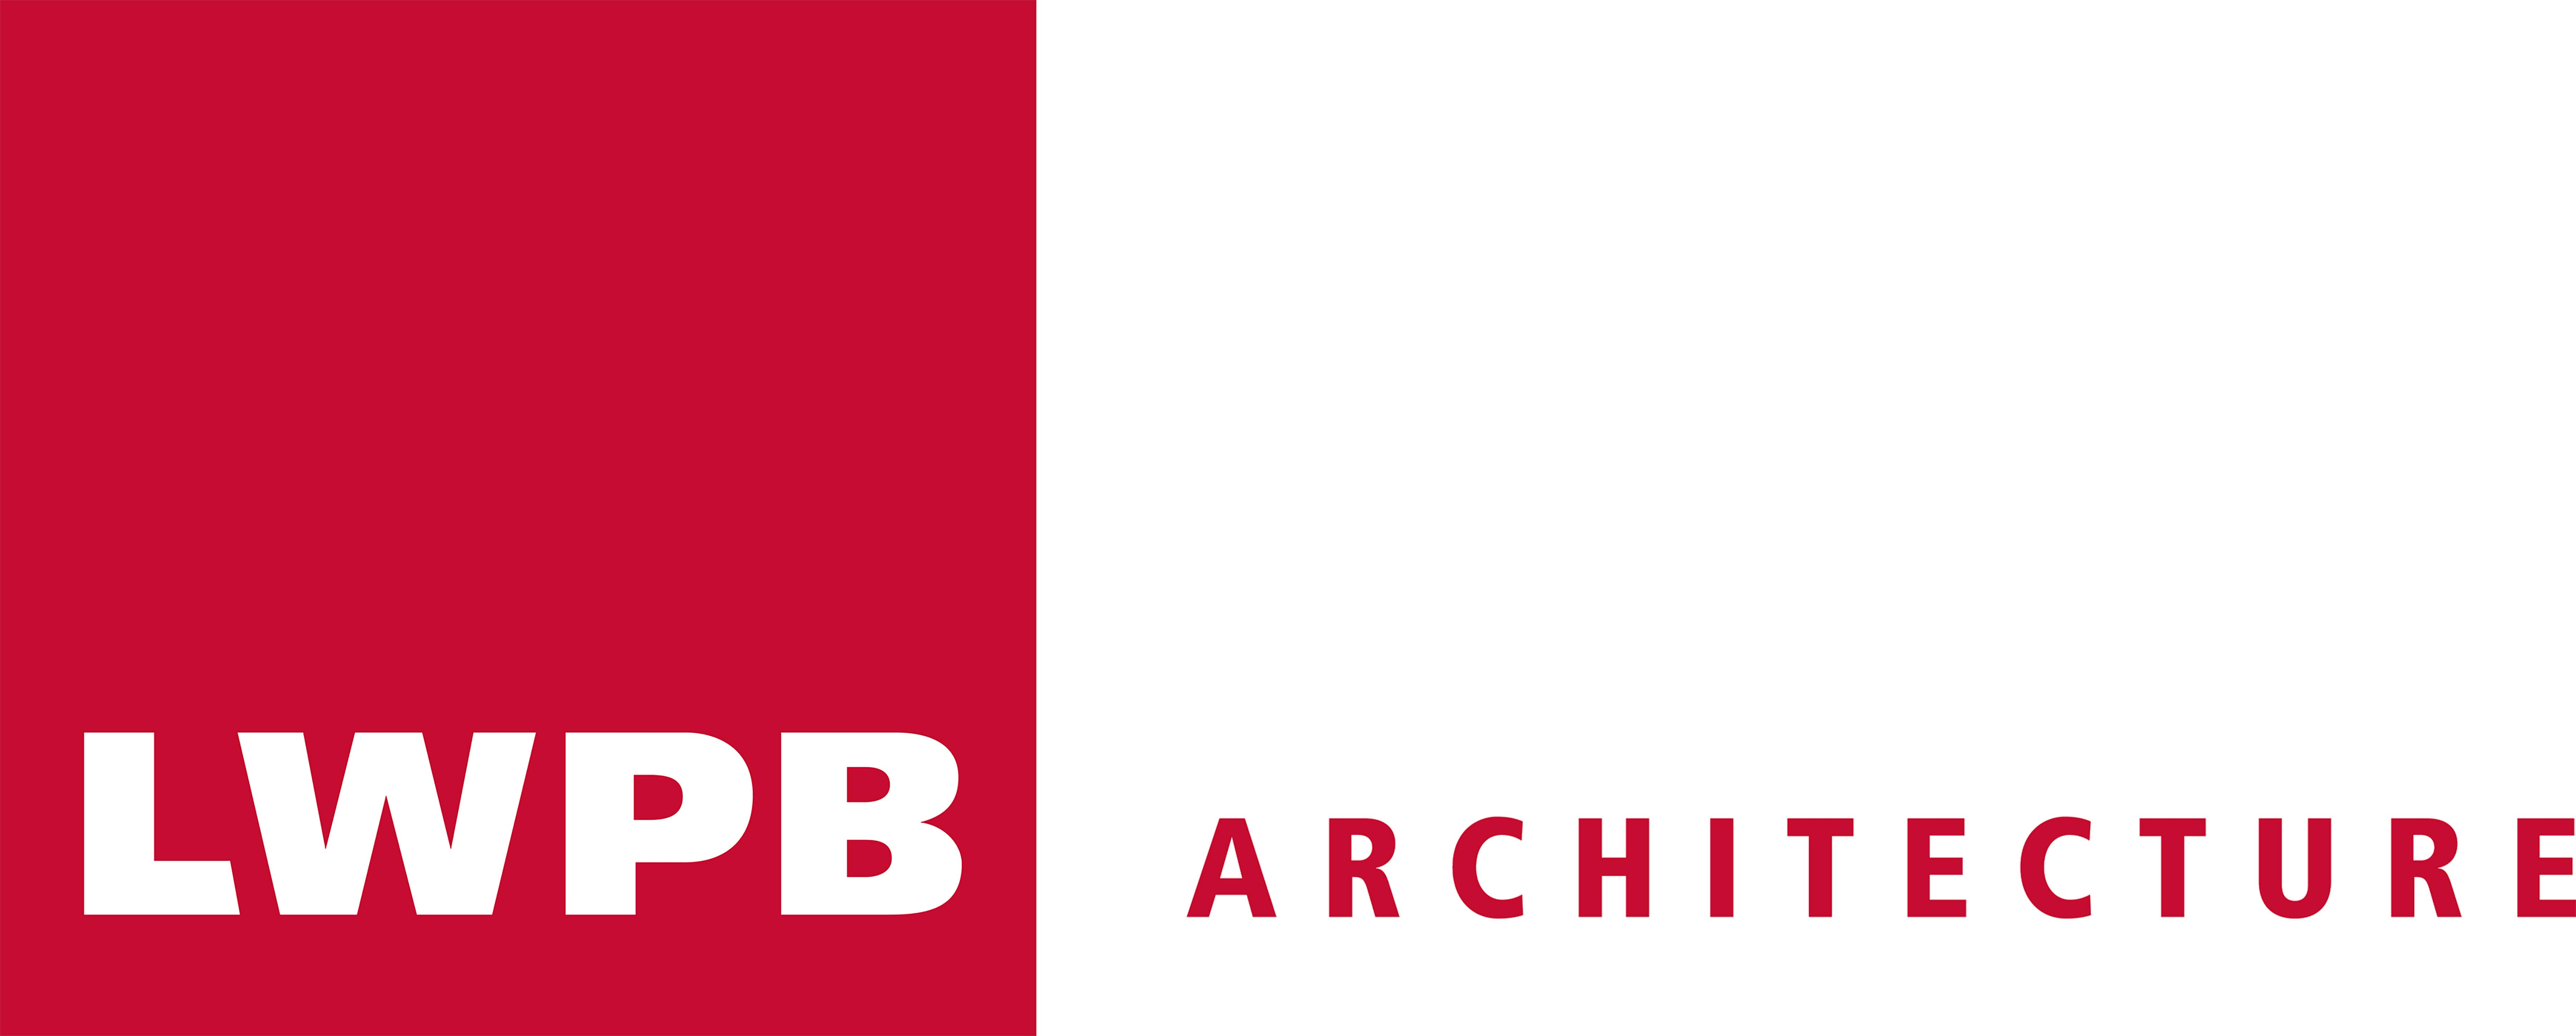 lwpb architecture